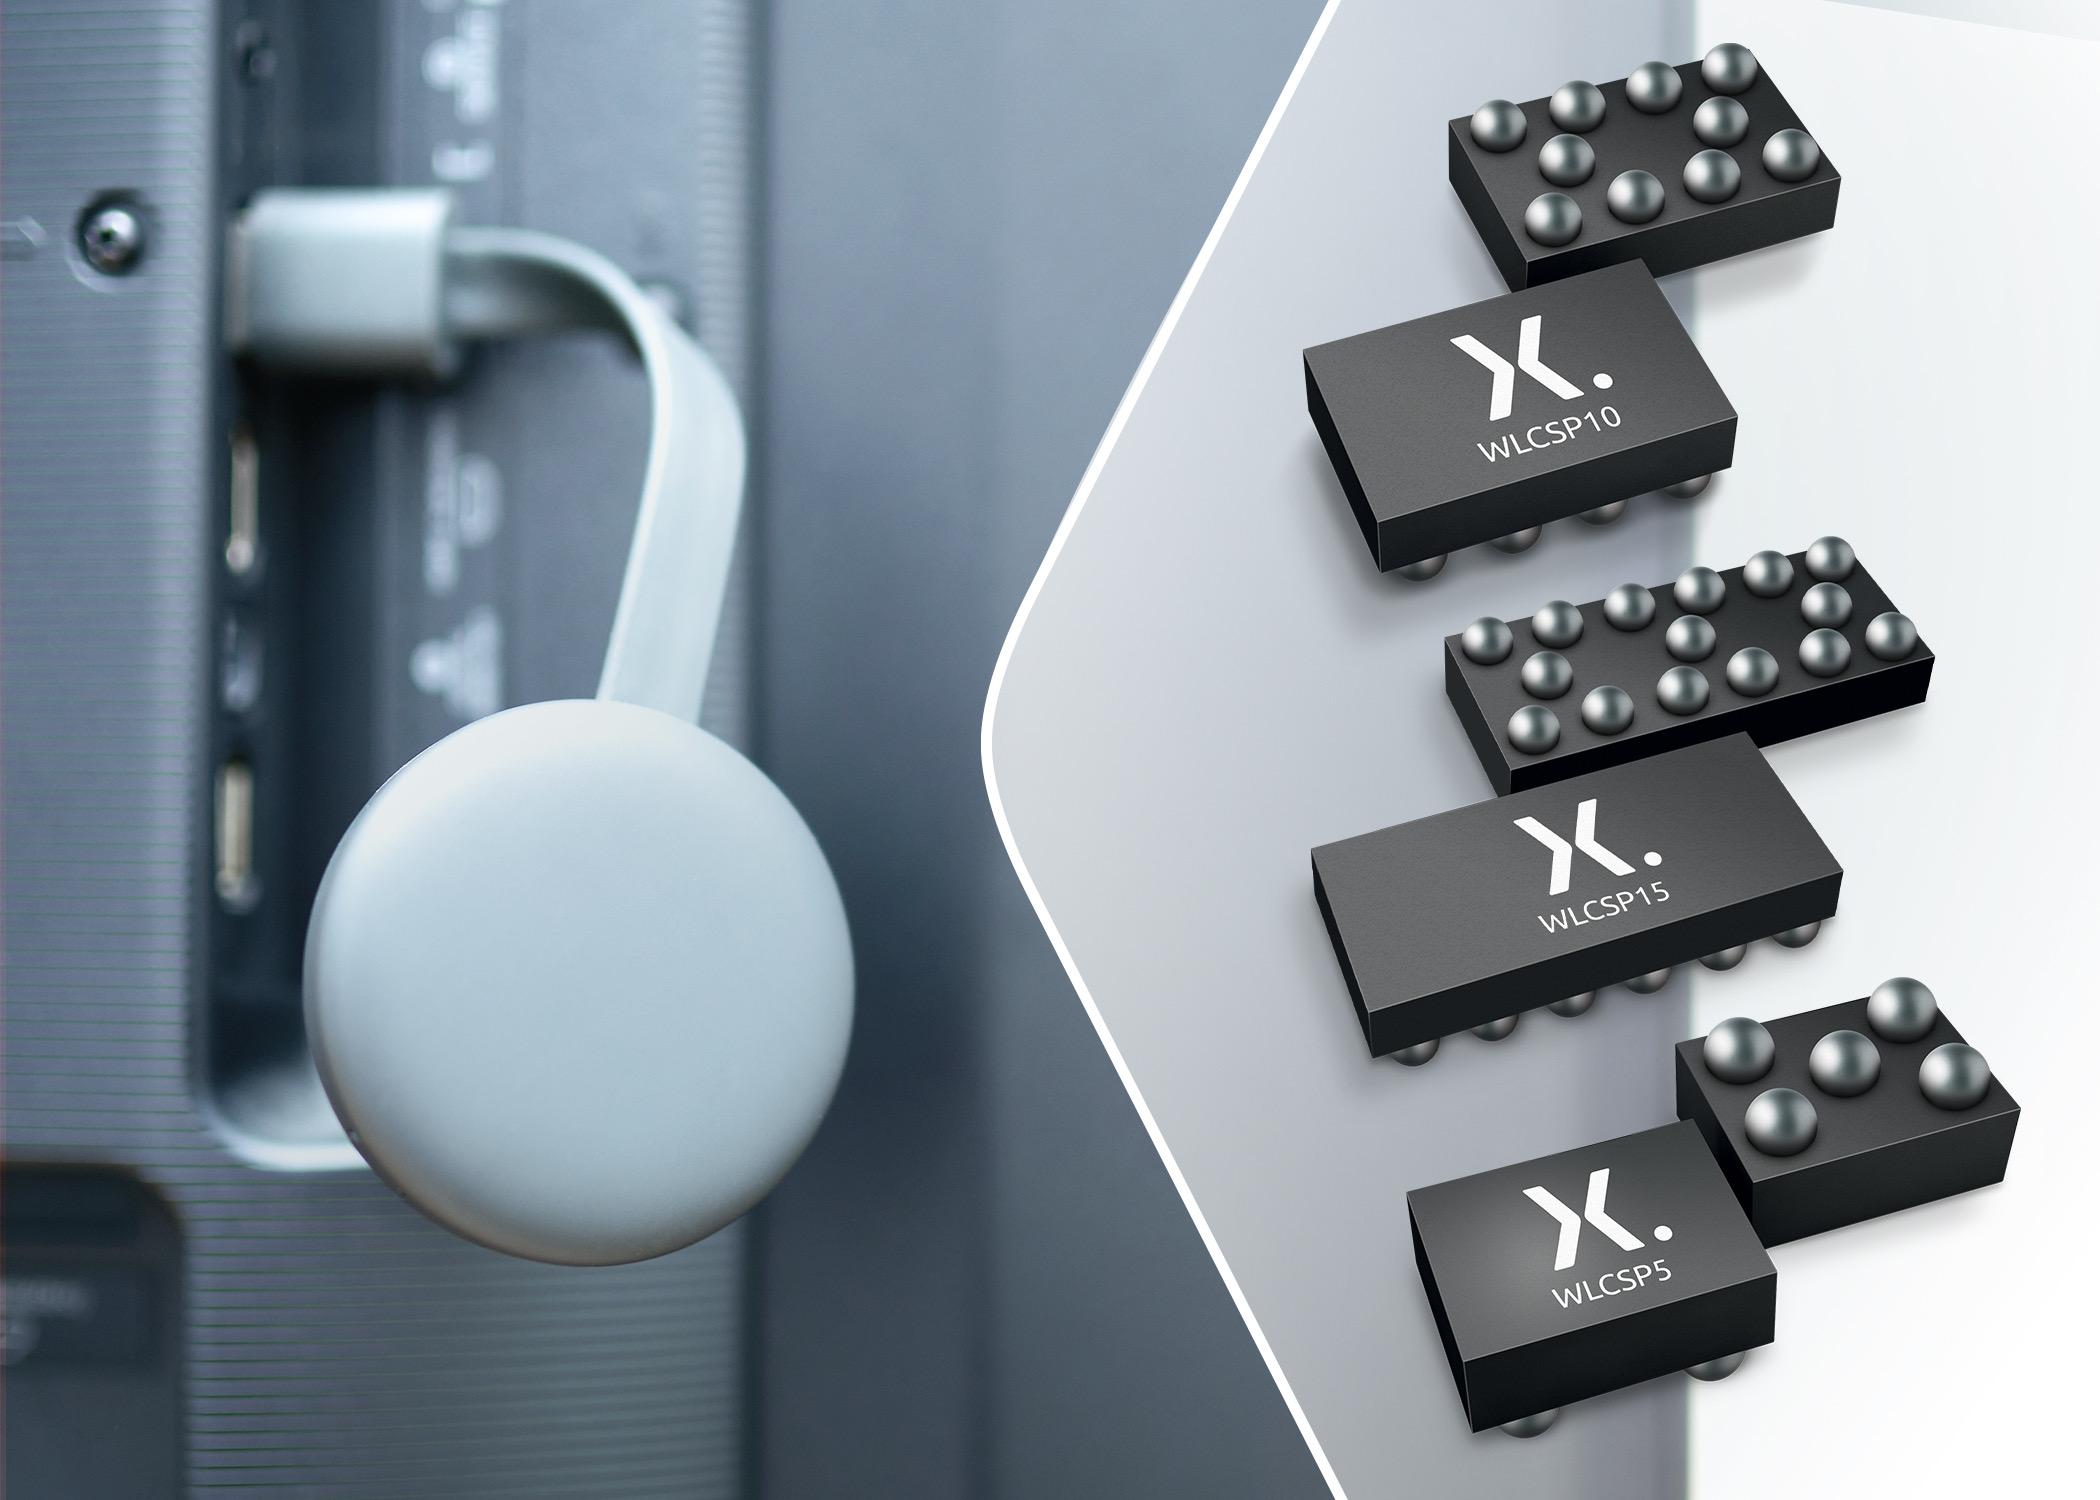 Nexperia推出用于HDMI 2.1和DP端口的具有ESD保护的共模滤波器